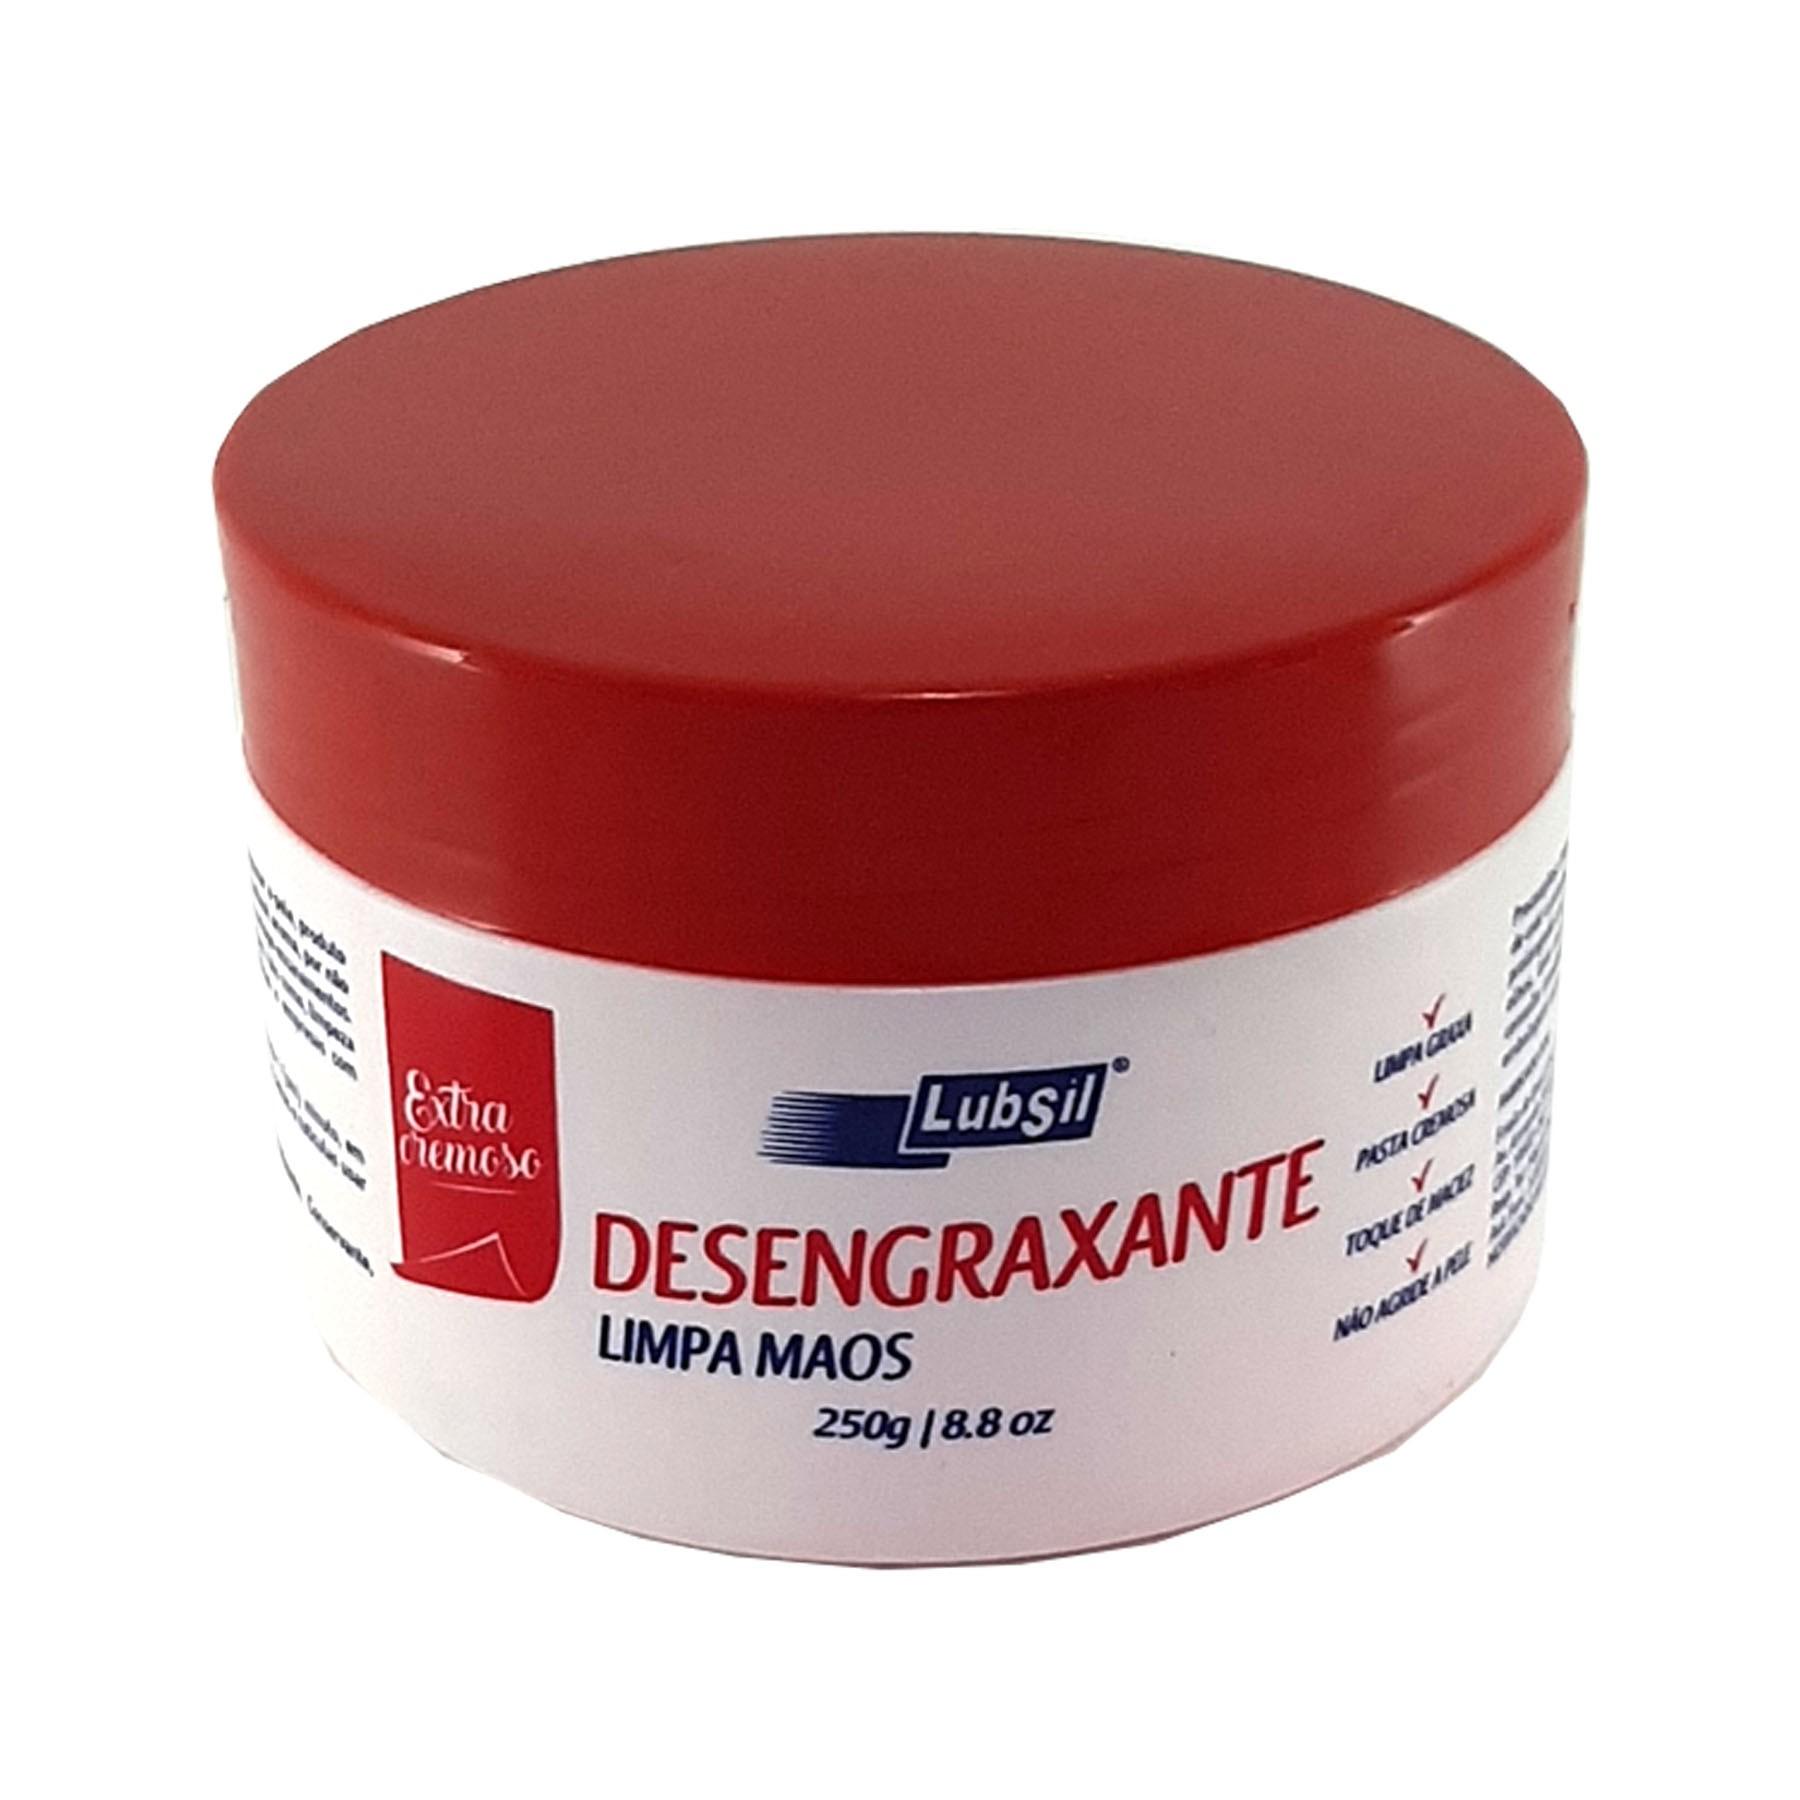 Pasta Cremosa Desengraxante 250g - Lubsil